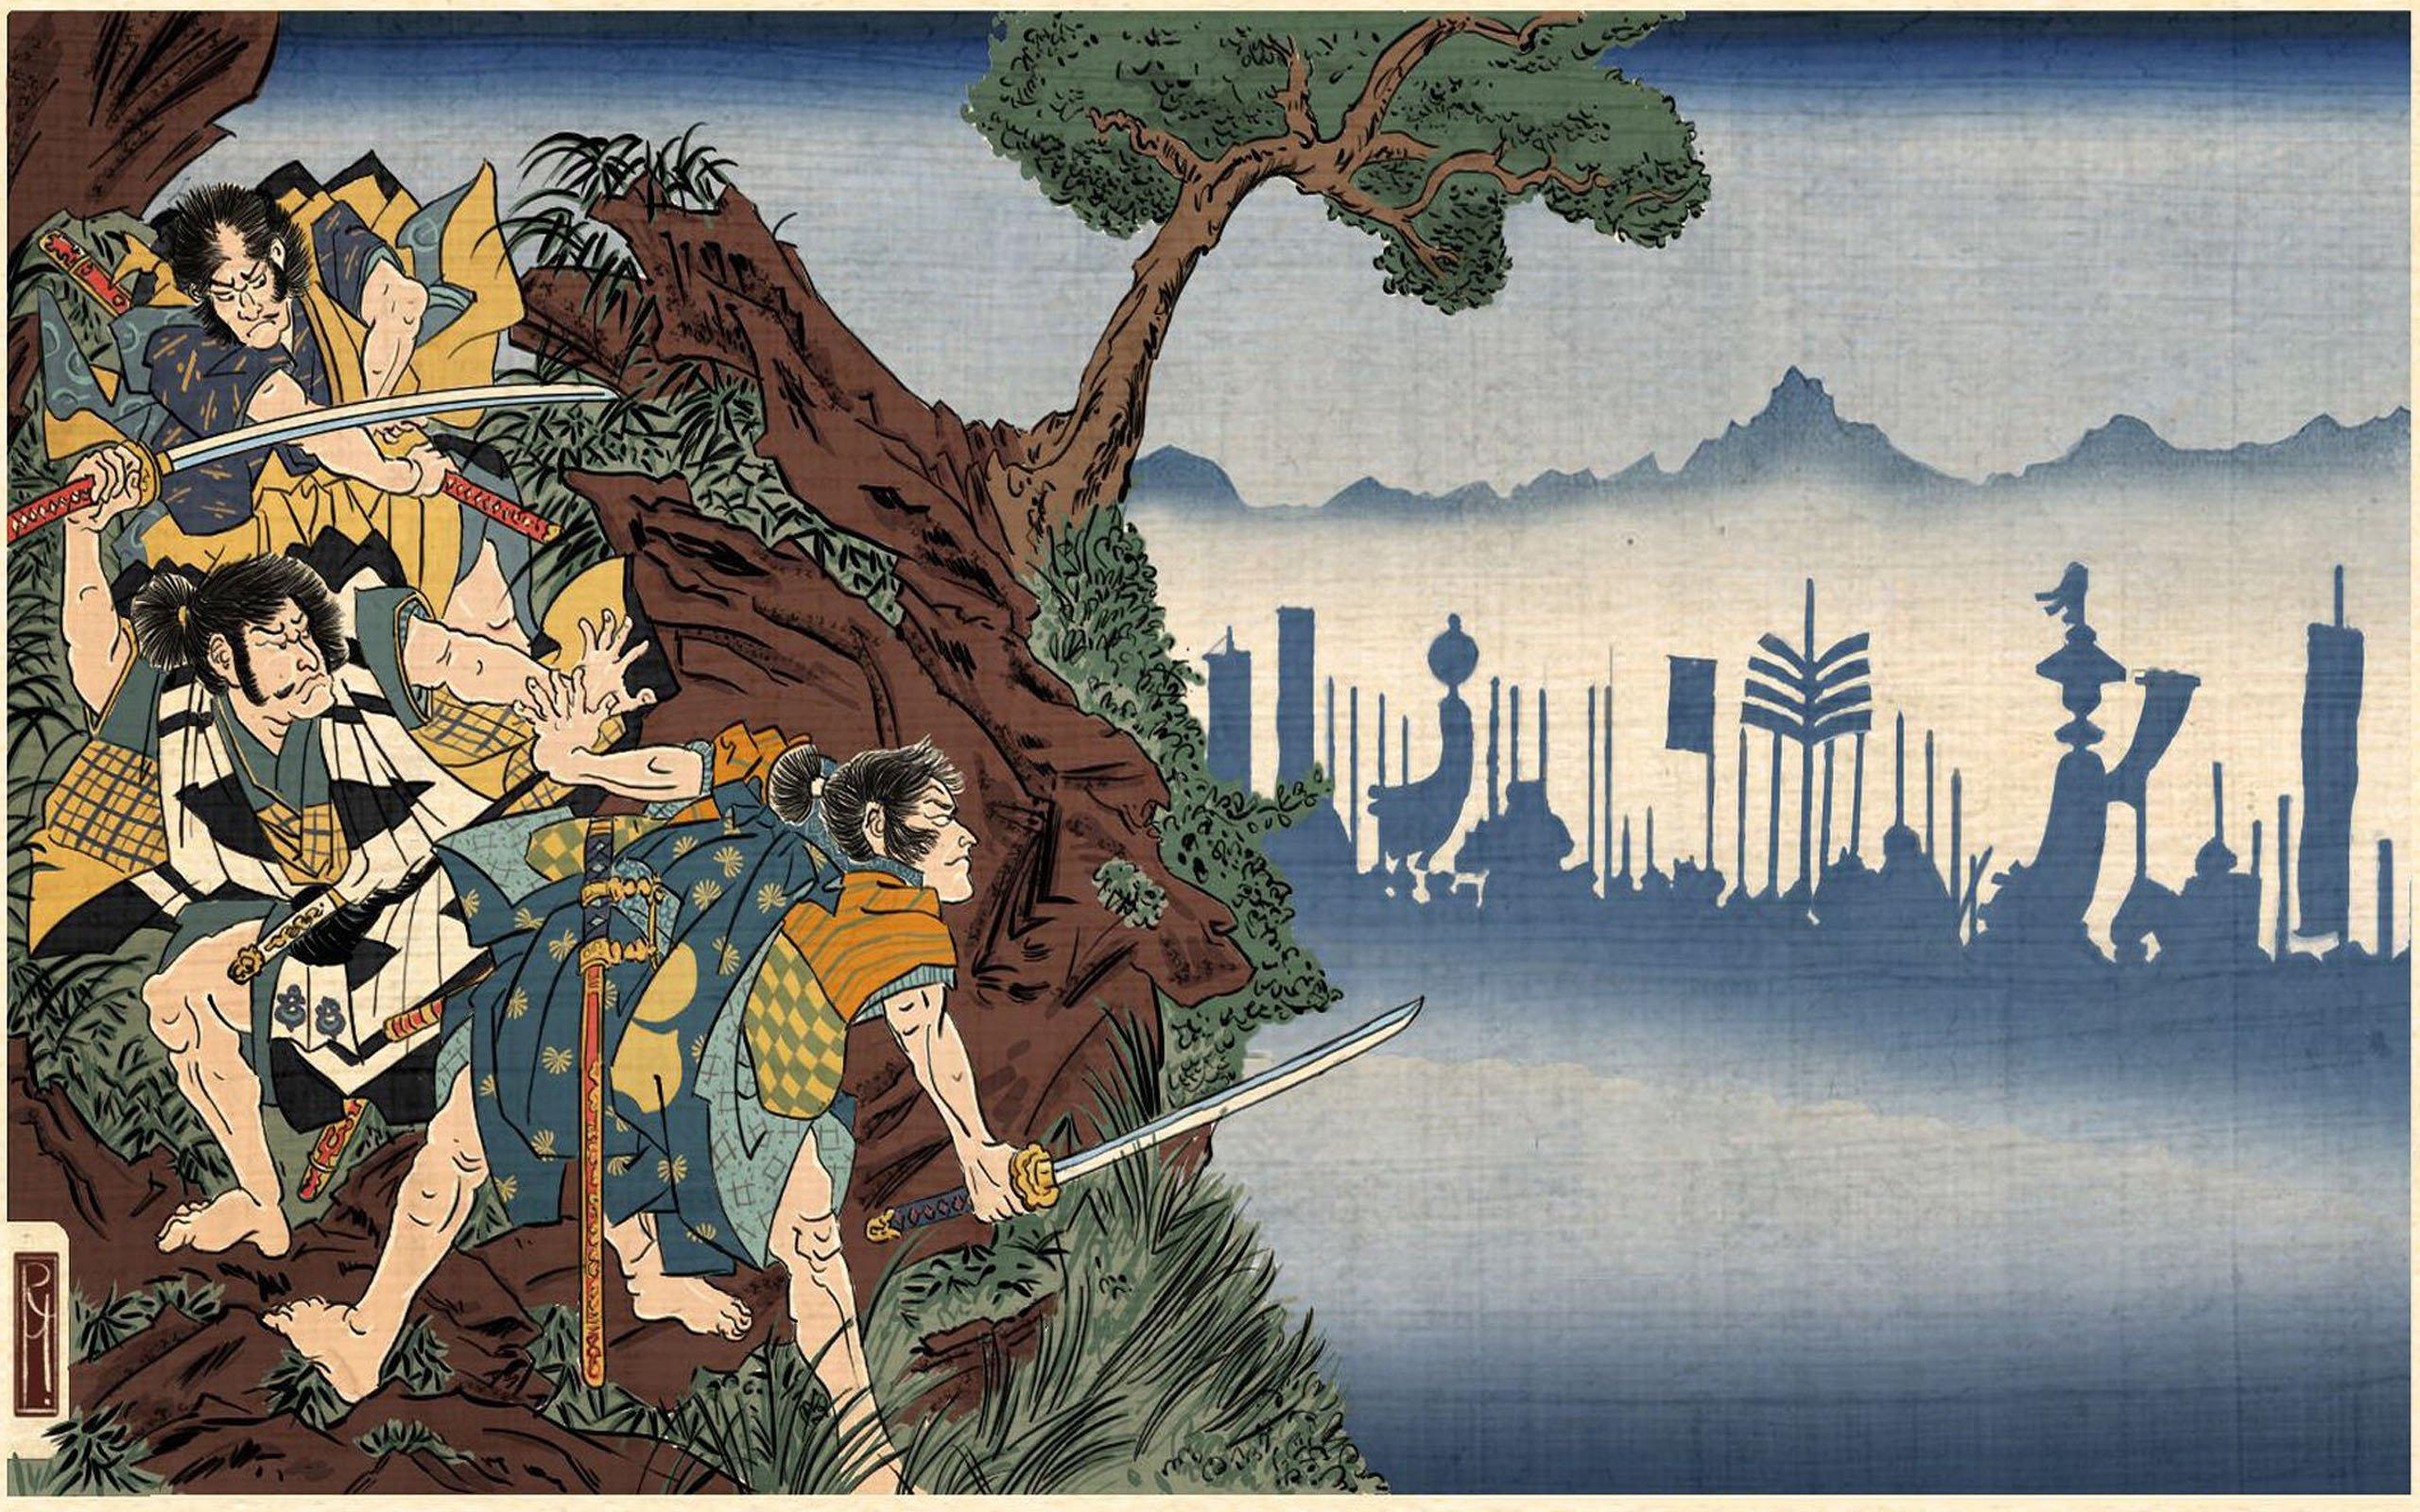 Total War Shogun 2 Fall Of The Samurai Wallpaper Hd Total War Shogun 2 Wallpaper 4 Wallpapersbq